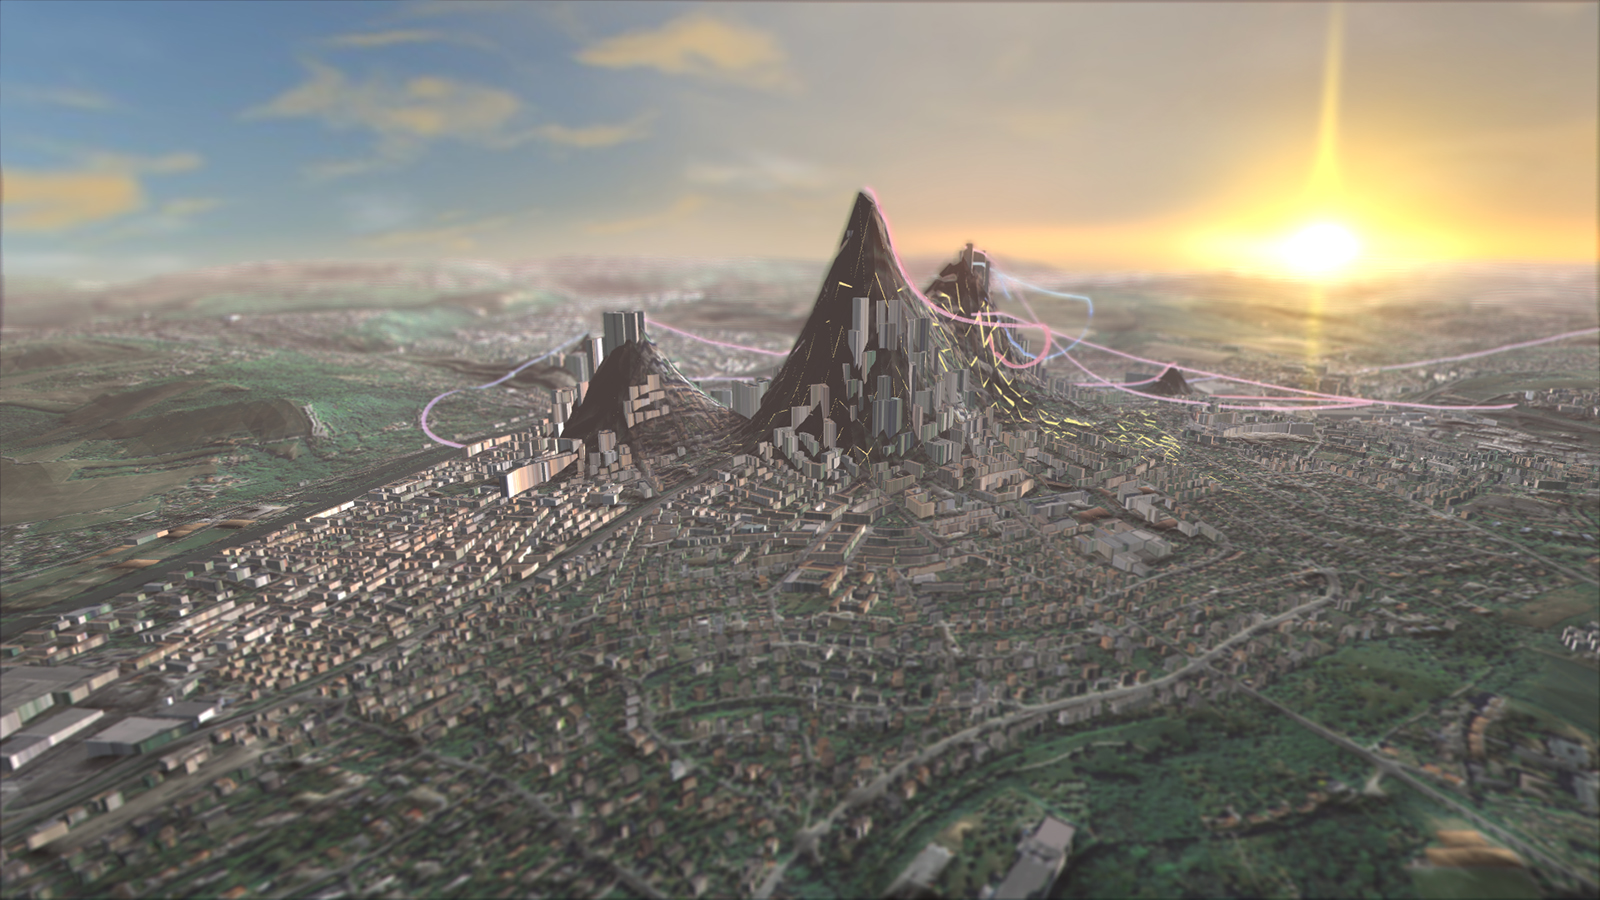 Is utopia possible